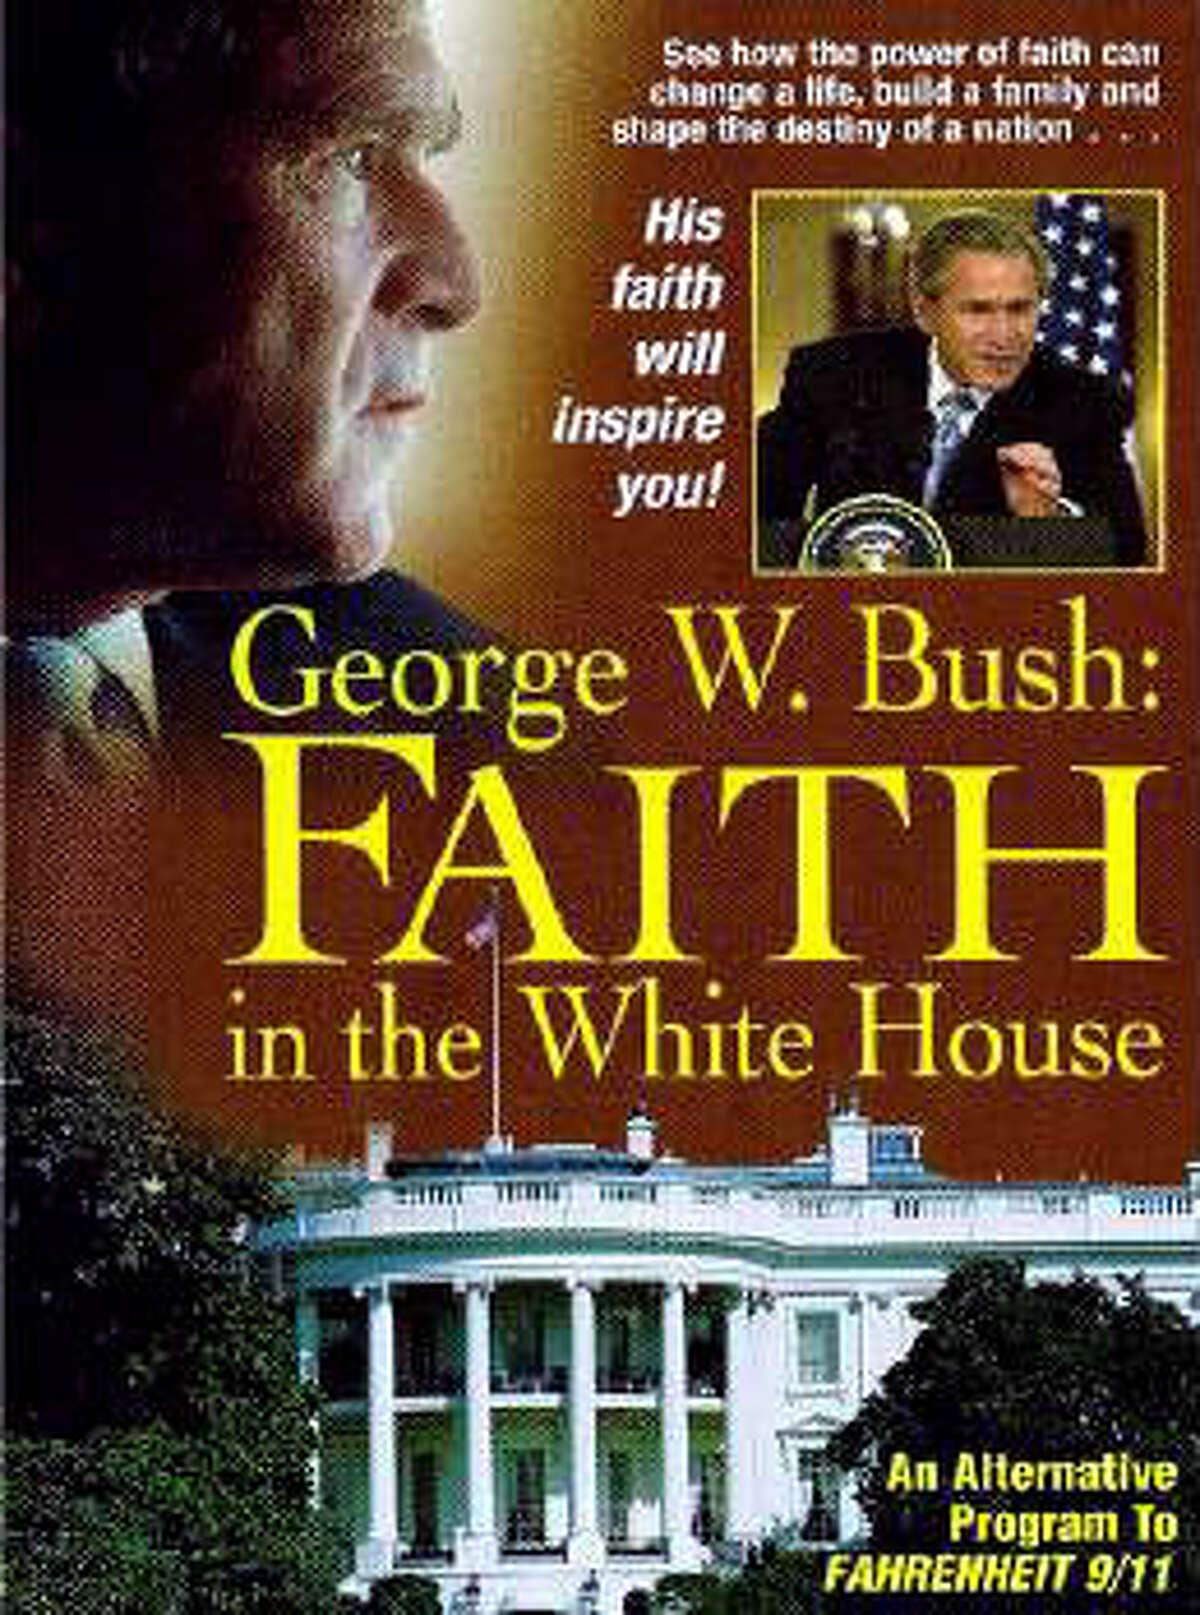 BUSHDVD14 DVD COVER... Datebook#Datebook#Chronicle#10/16/2004#ALL#Advance##0422409383